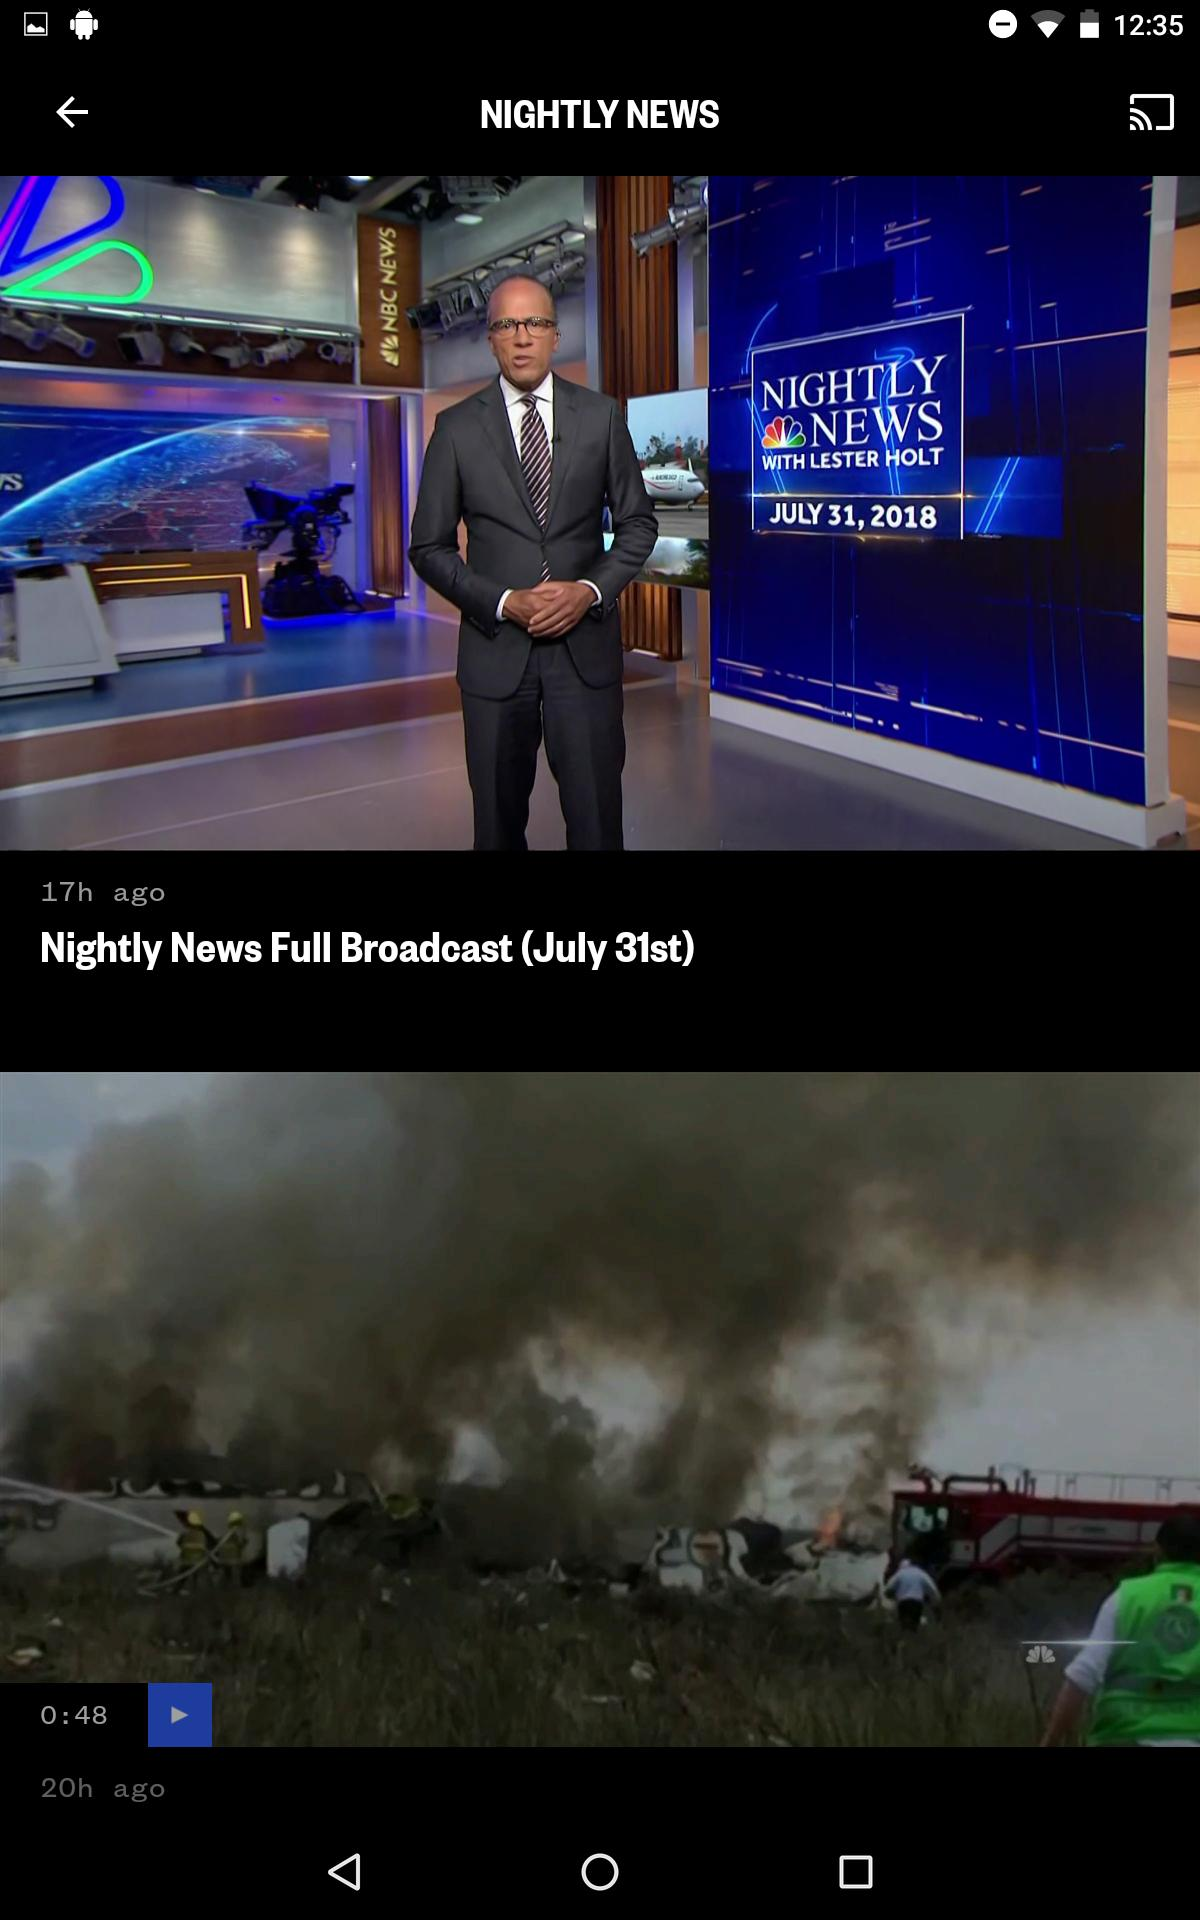 NBC News: Breaking News, US News & Live Video 6.0.11 Screenshot 15